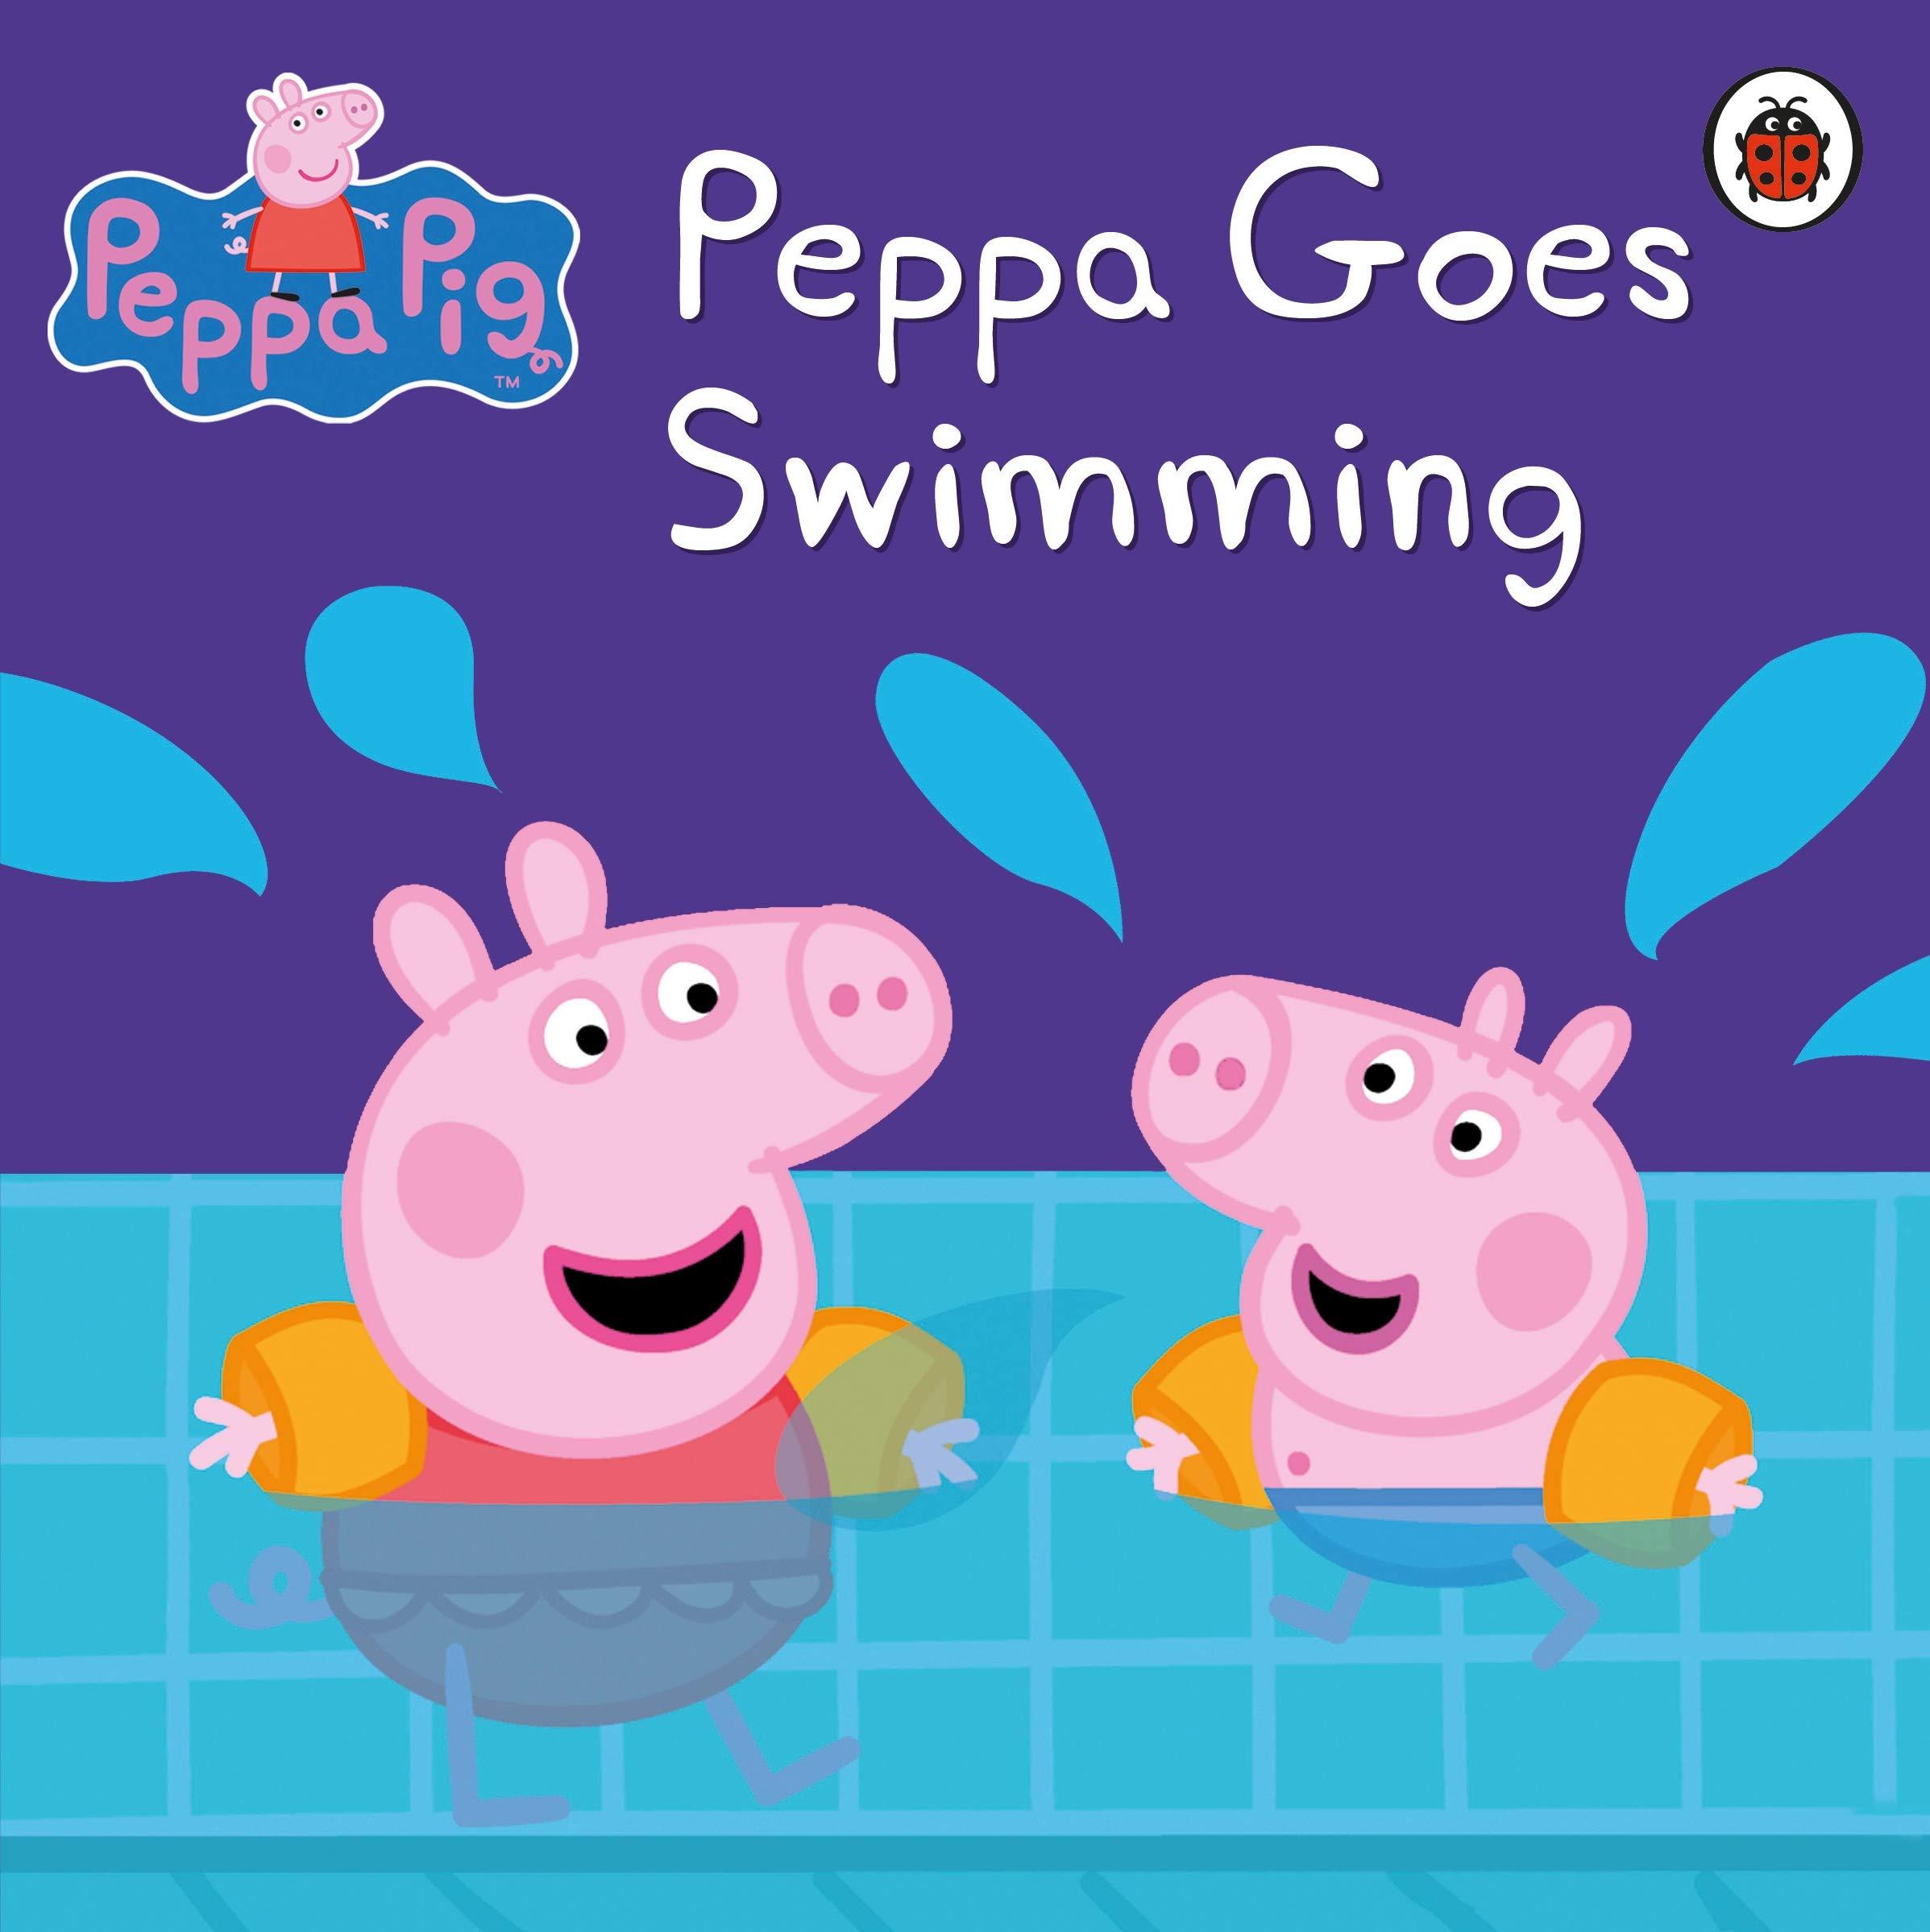 Peppa Pig Peppa Goes Swimming Amazon Co Uk Peppa Pig